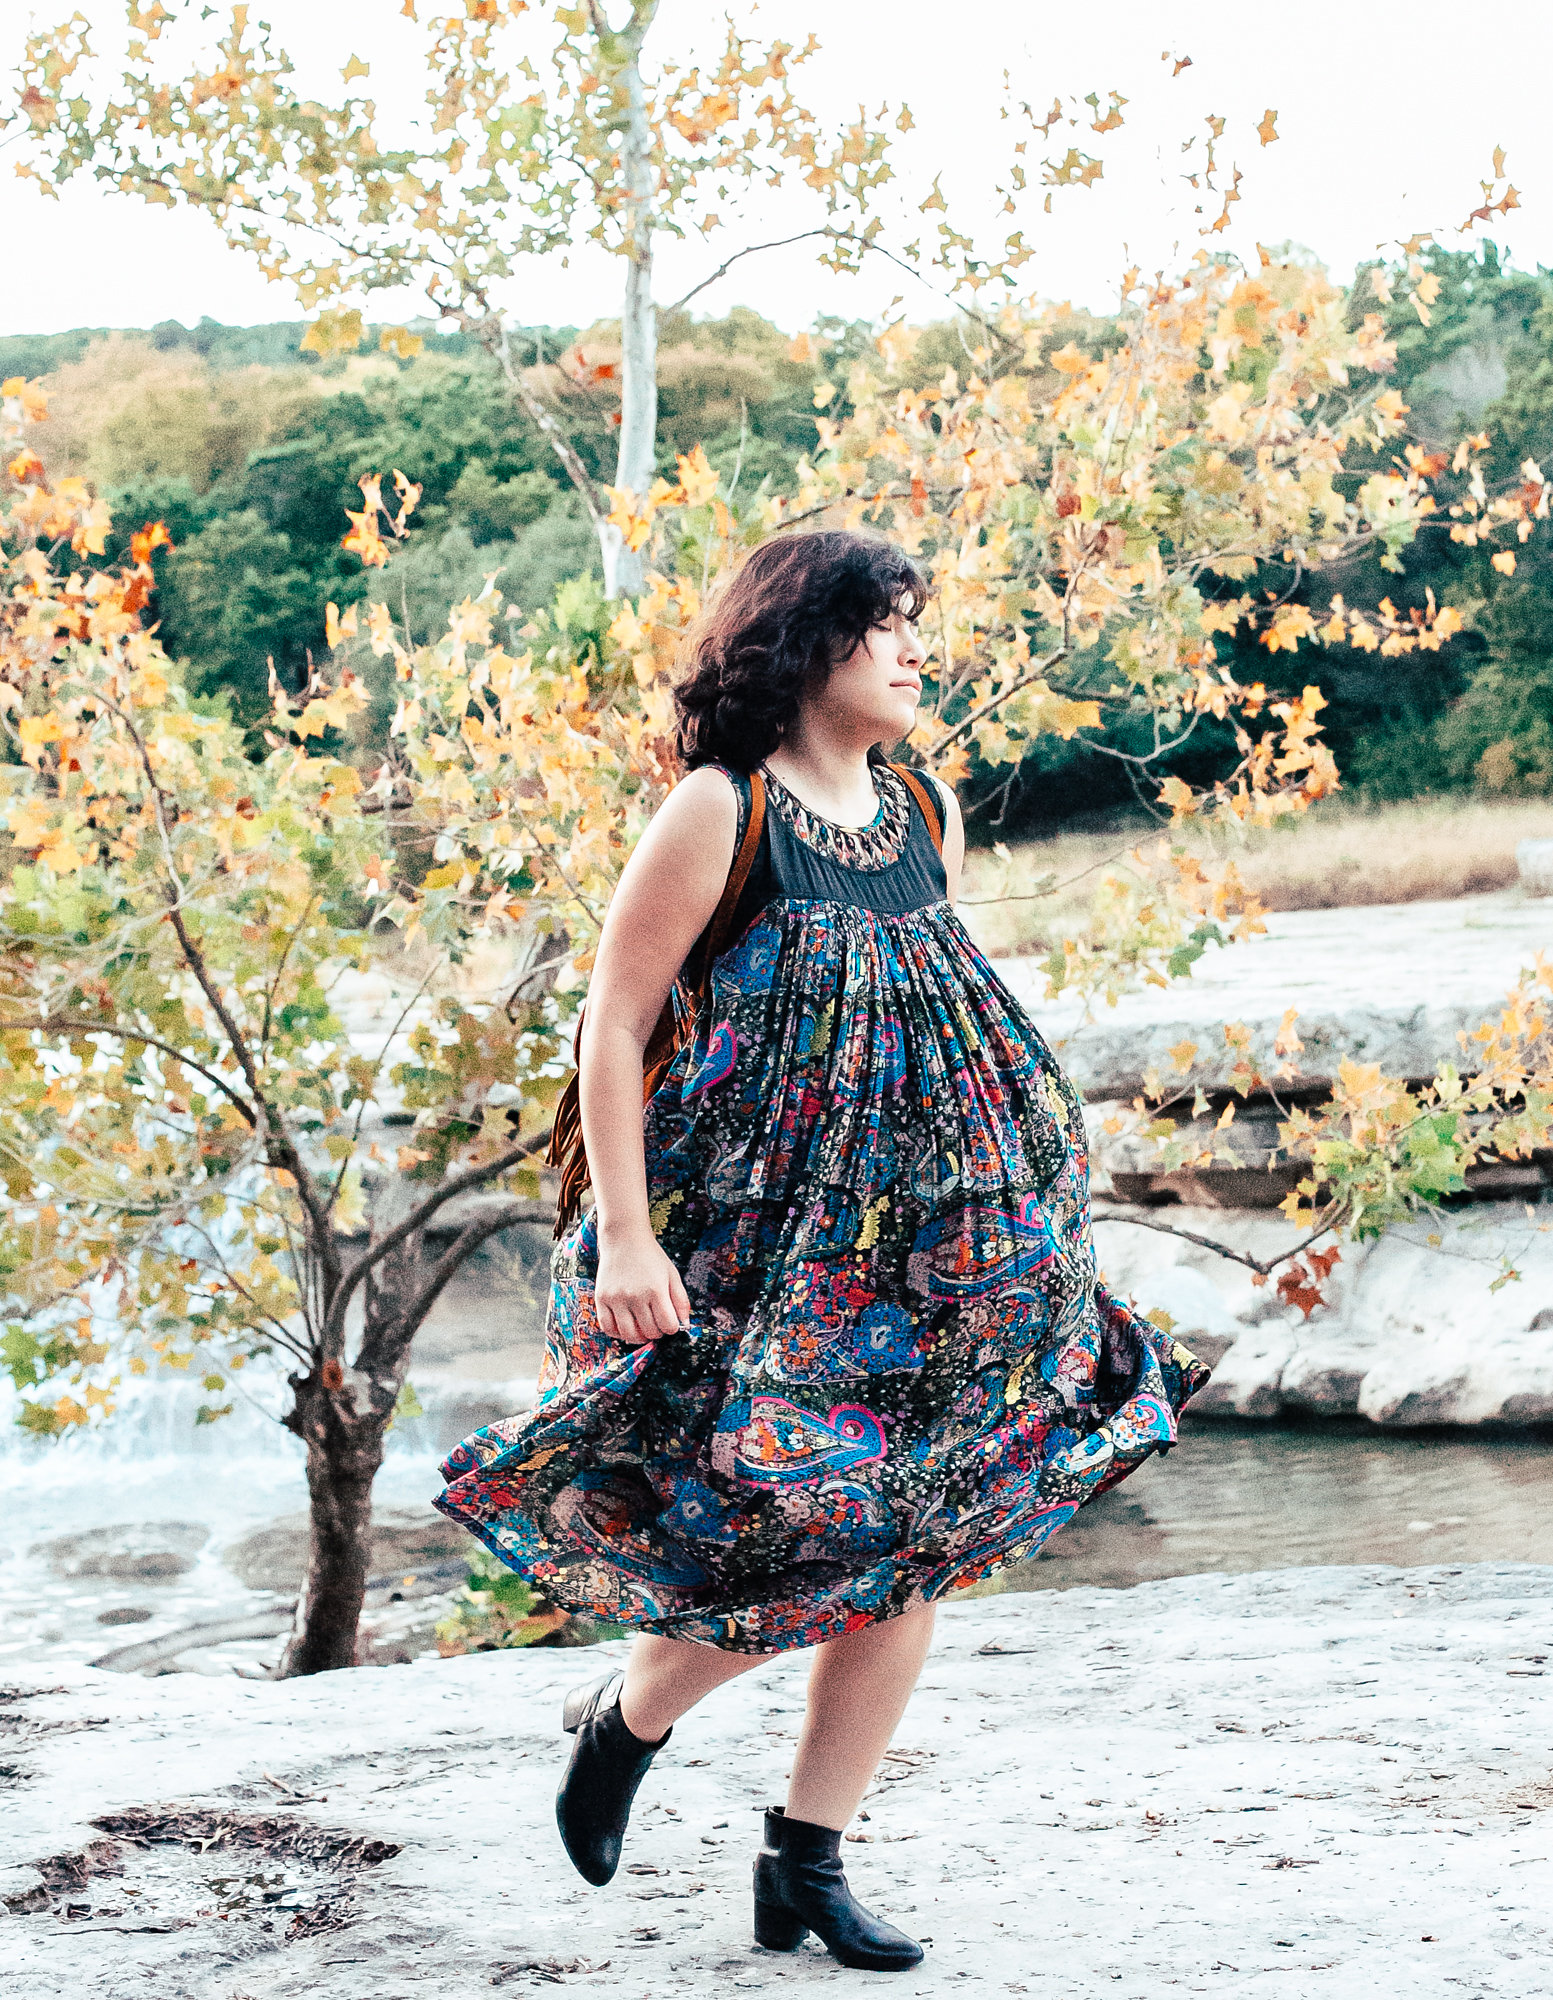 Pieceology-Vintage-1970s-Black-Latticed-Collar-Colorful-Printed-Dress-2.jpg